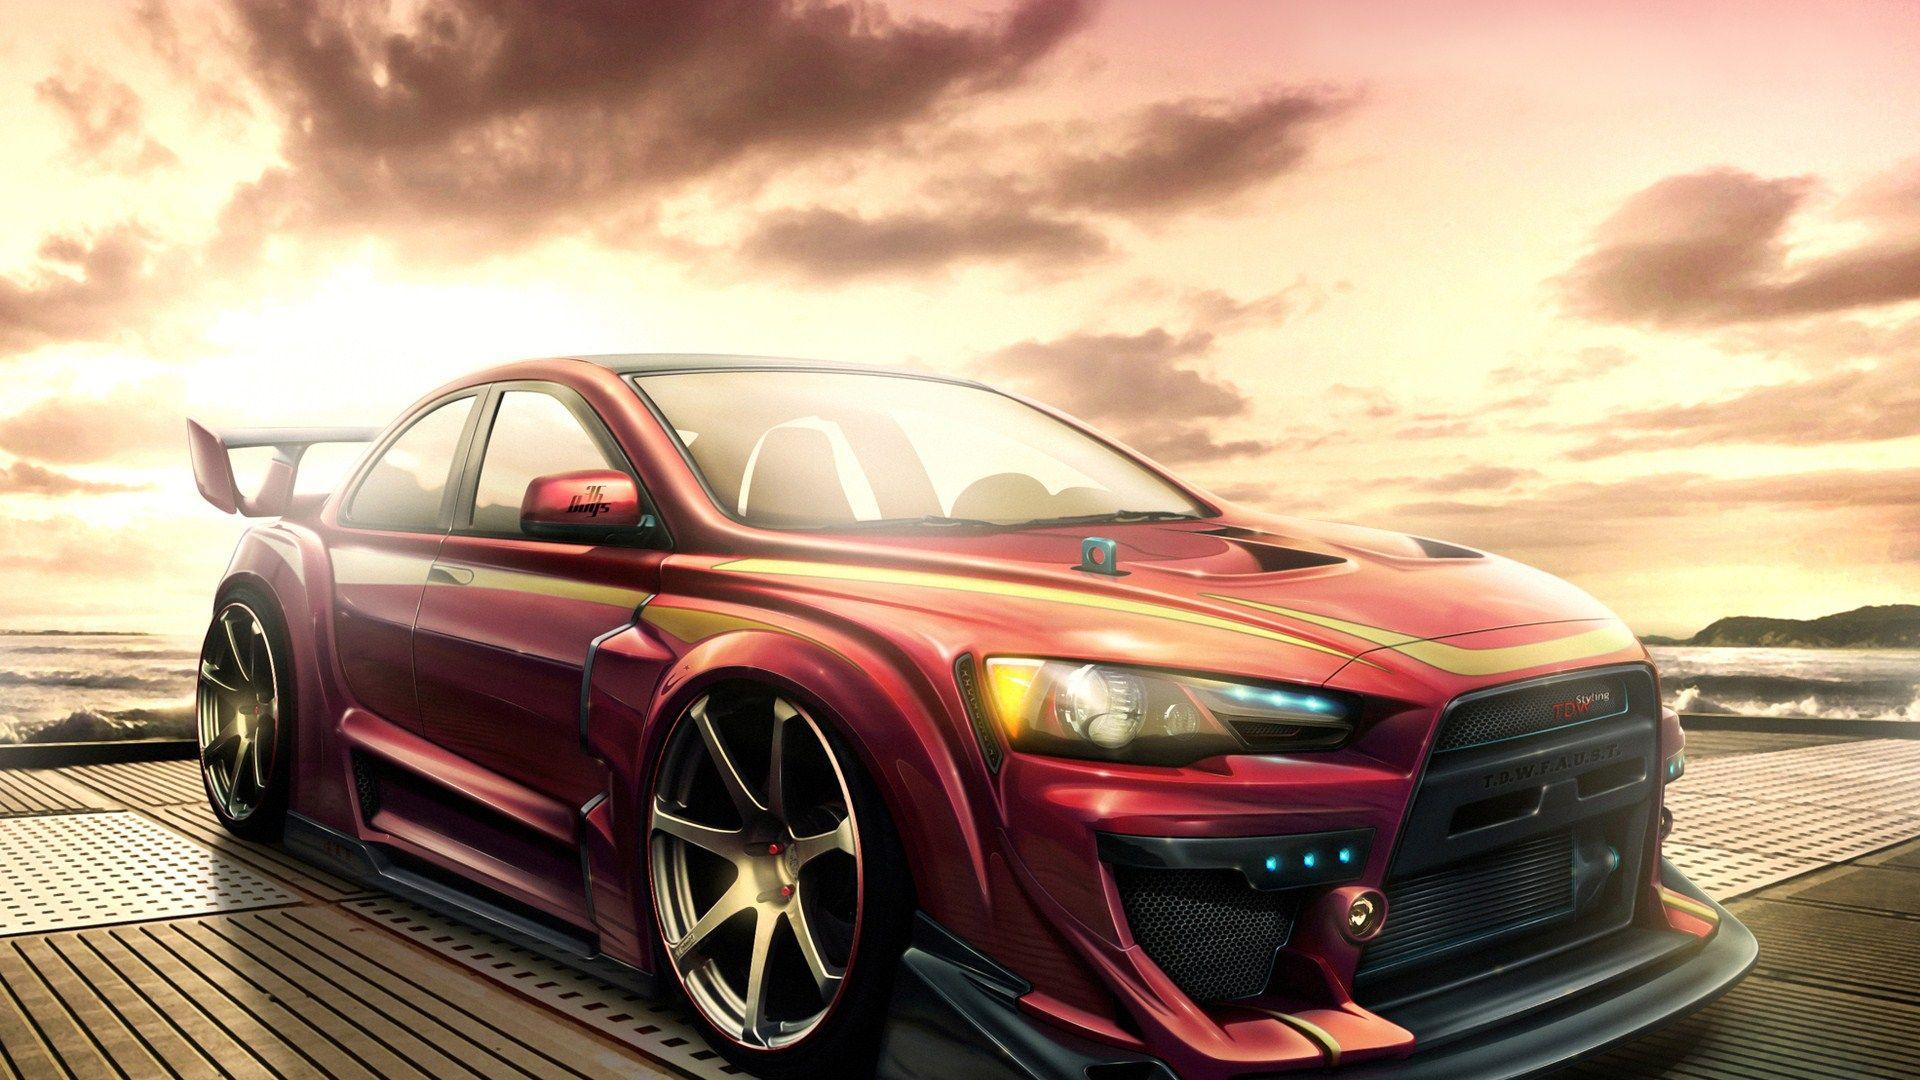 mitsubishi lancer evolution 1080p hd wallpaper 1080p hd wallpapers - Mitsubishi Lancer Evolution 2014 Wallpaper